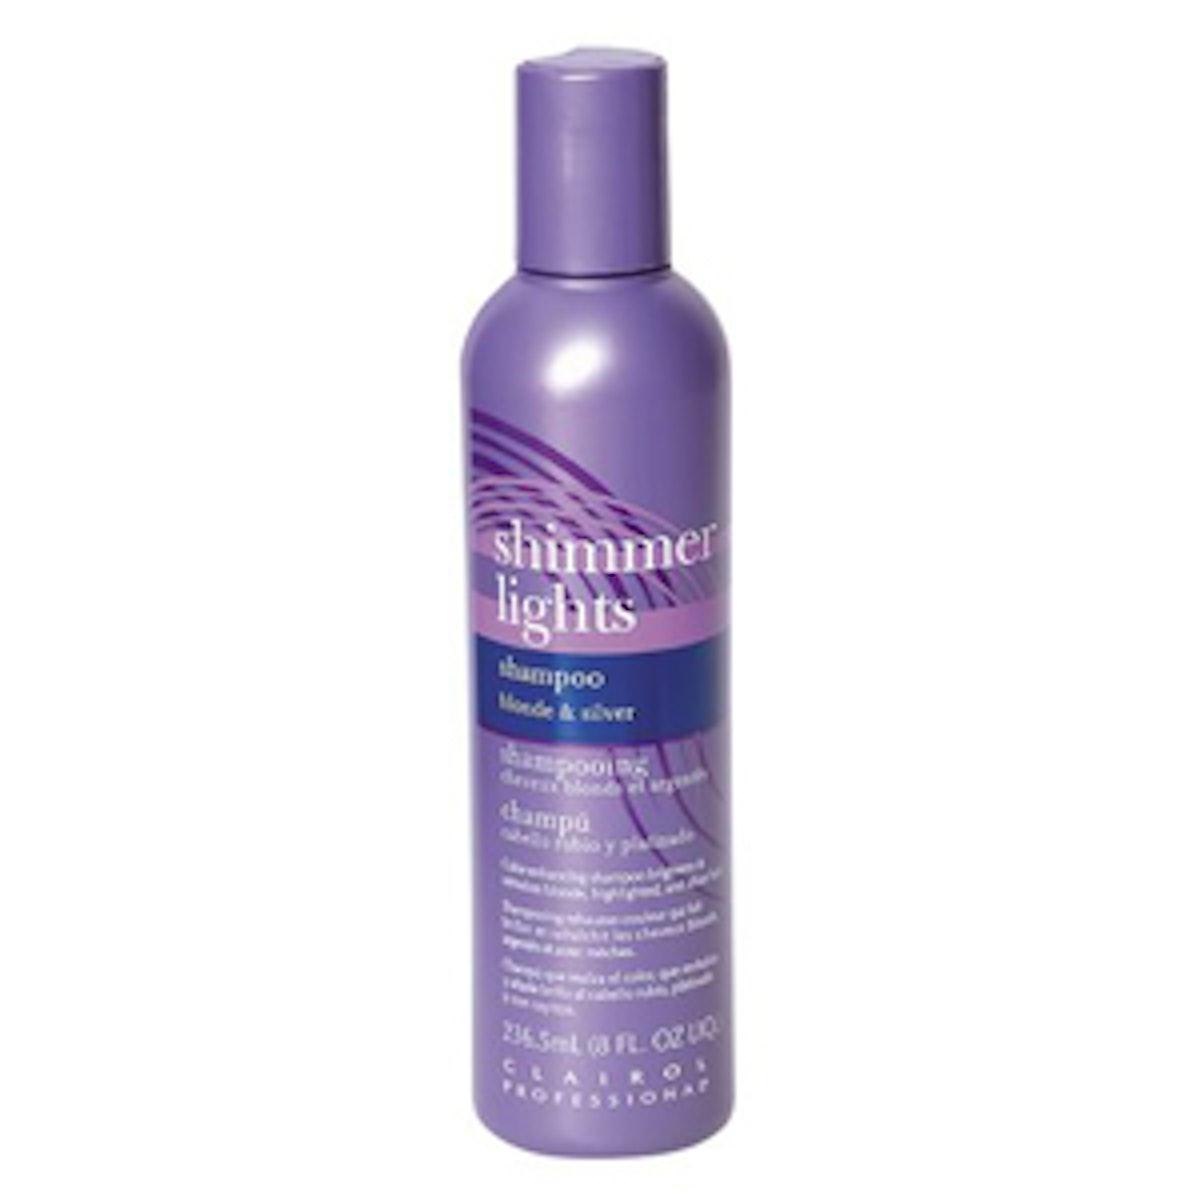 Clairol Professional Shimmer Lights Shampoo